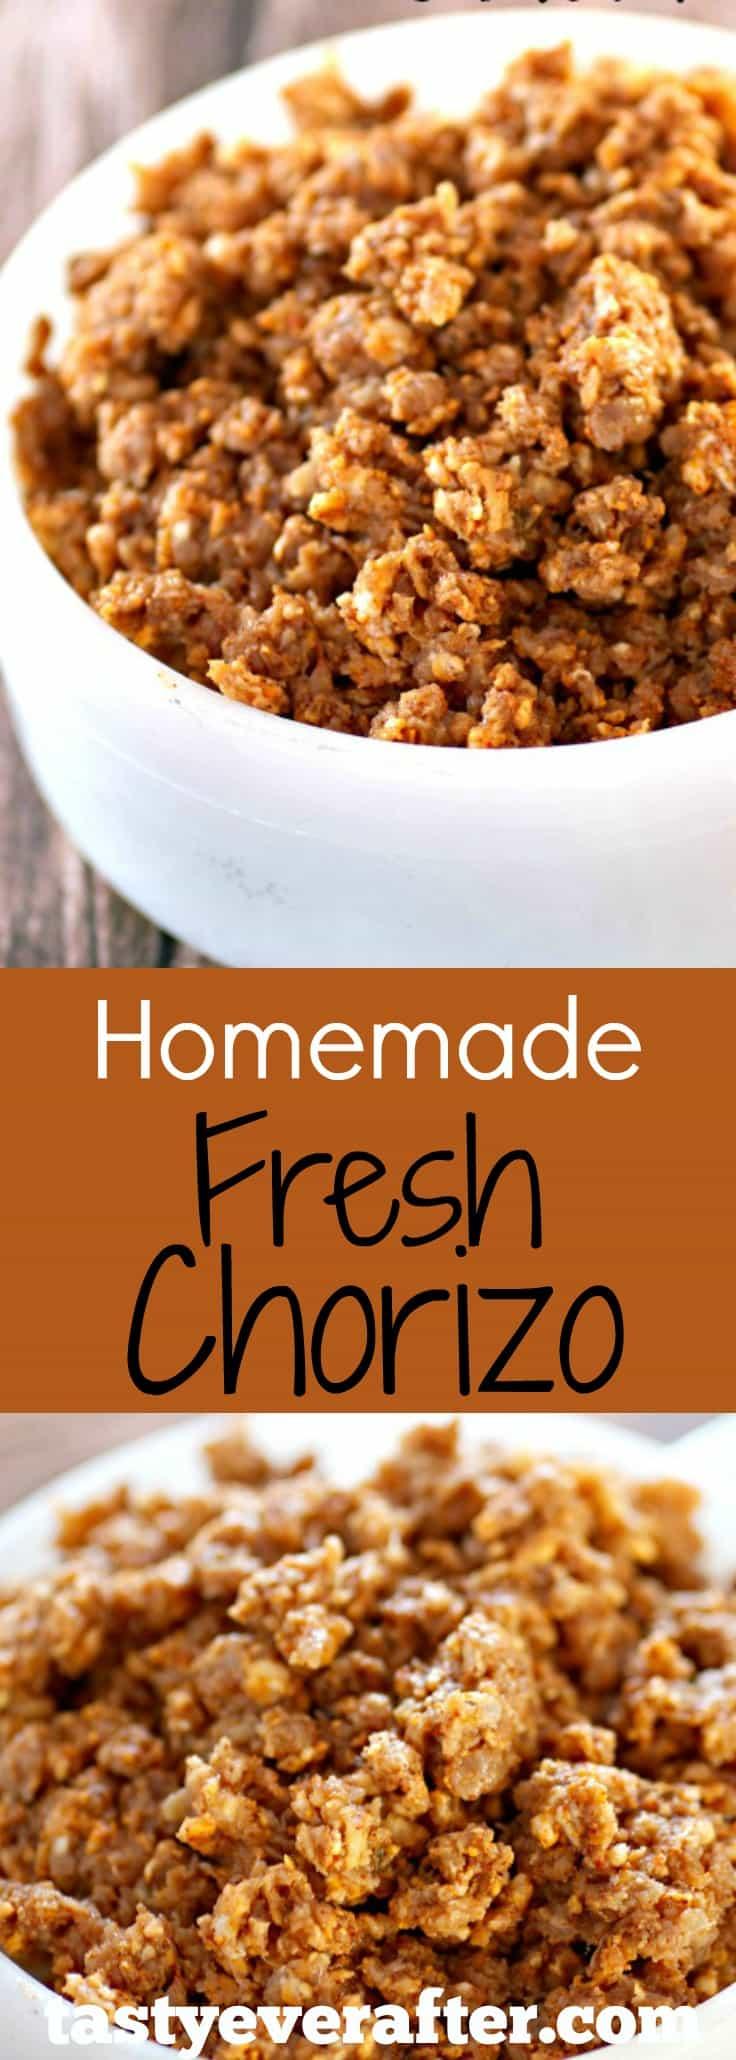 Homemade Fresh Chorizo | Tasty Ever After